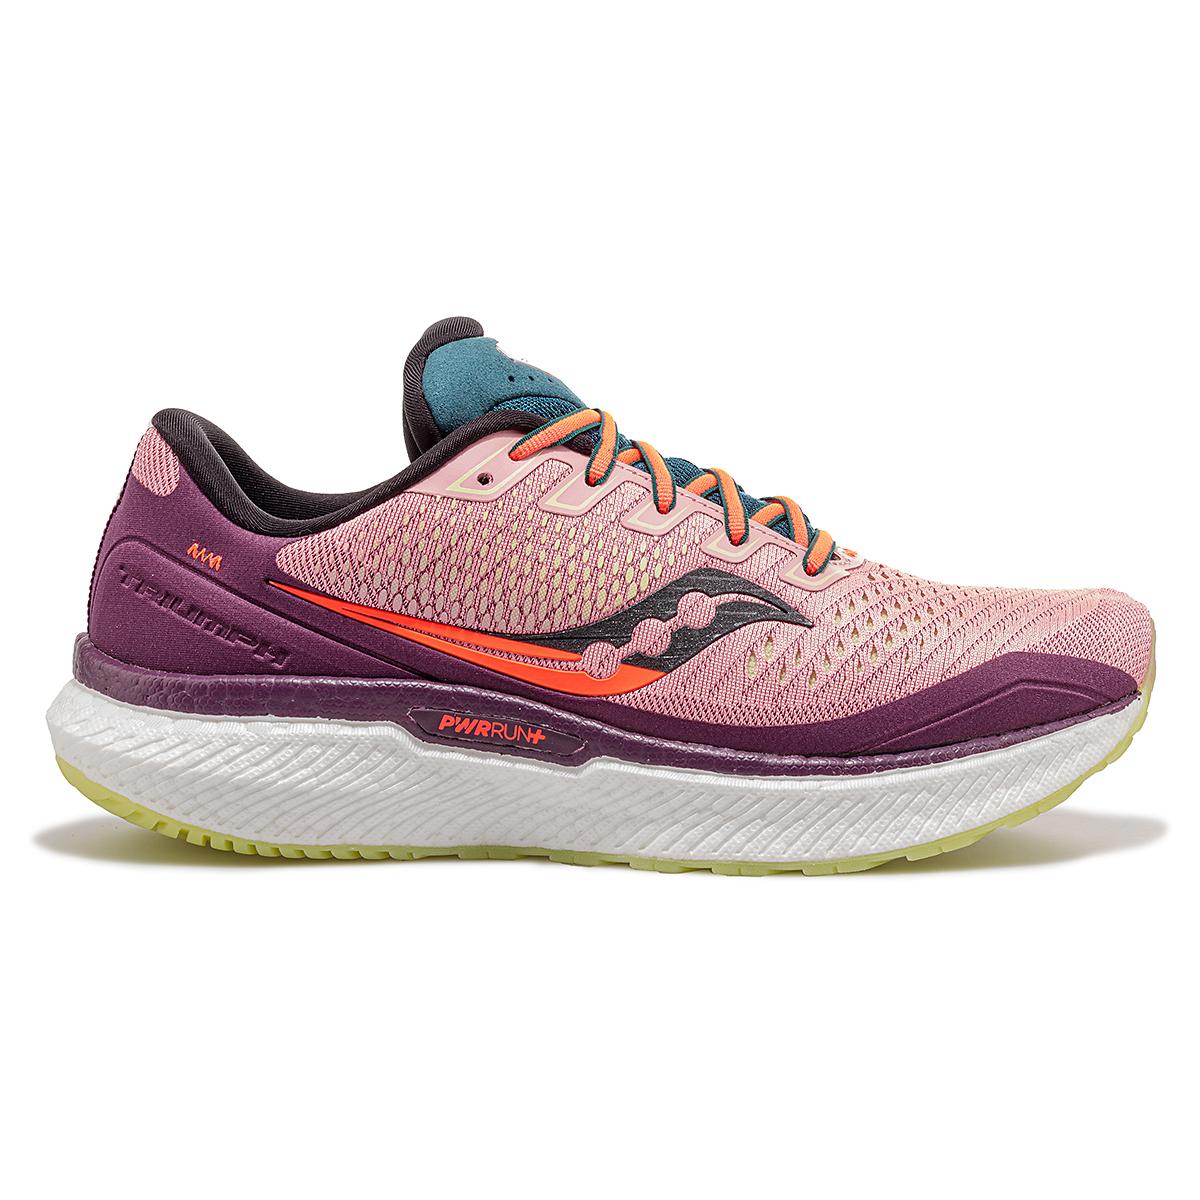 Women's Saucony Jackalope 2.0 Triumph 18 Running Shoe - Color: Jackalope - Size: 5 - Width: Regular, Jackalope, large, image 1